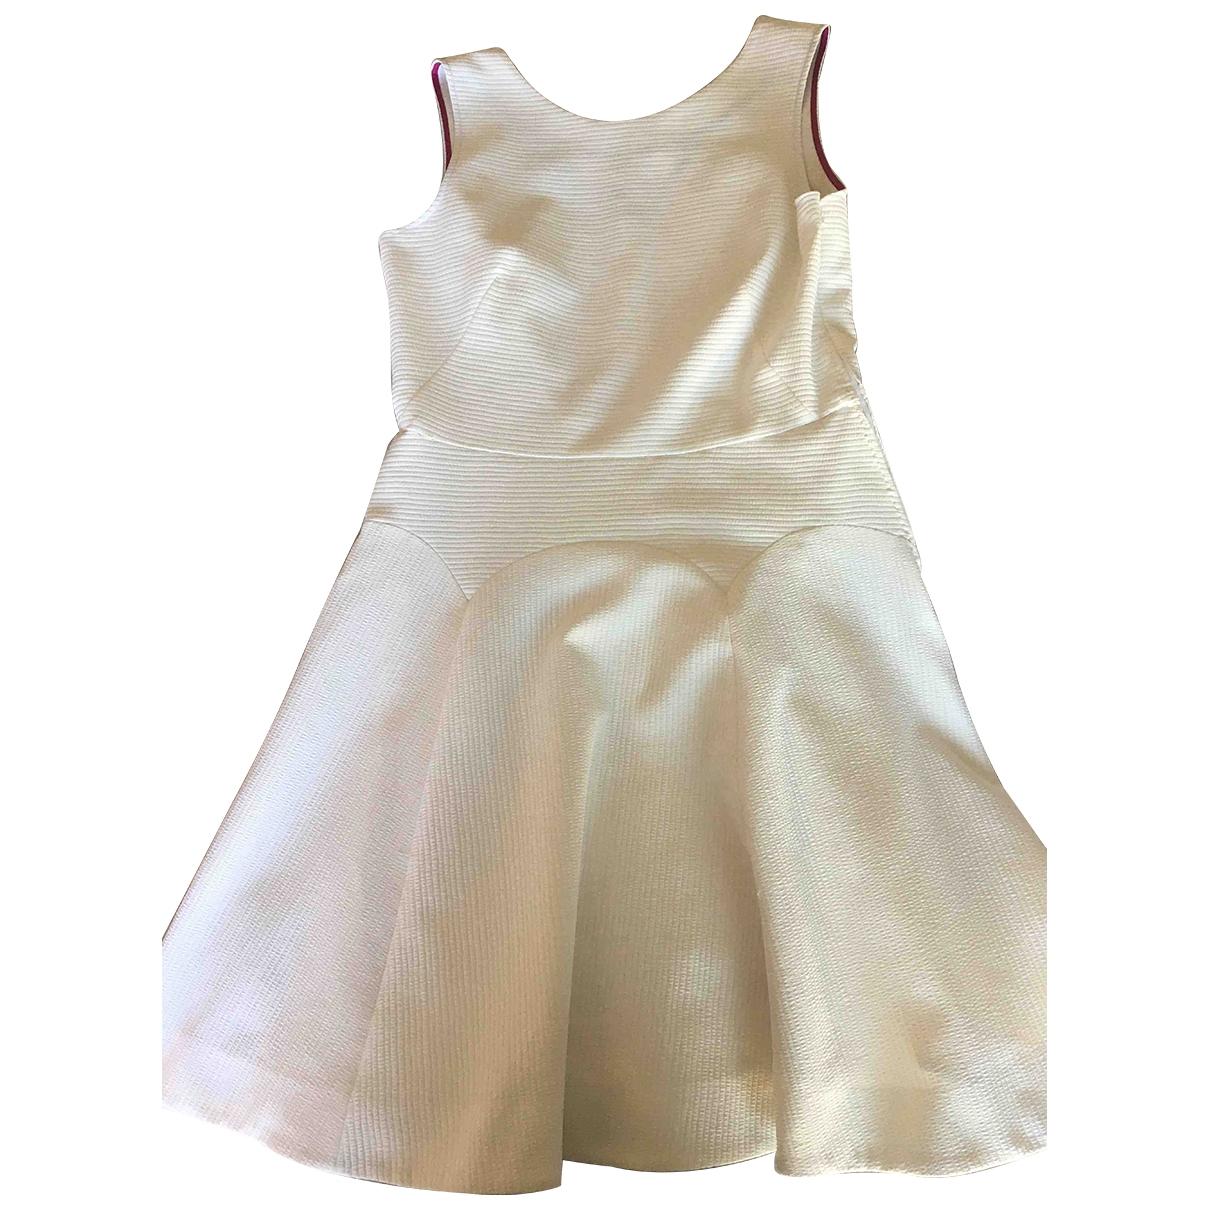 Paul Smith \N White Cotton dress for Women 44 IT